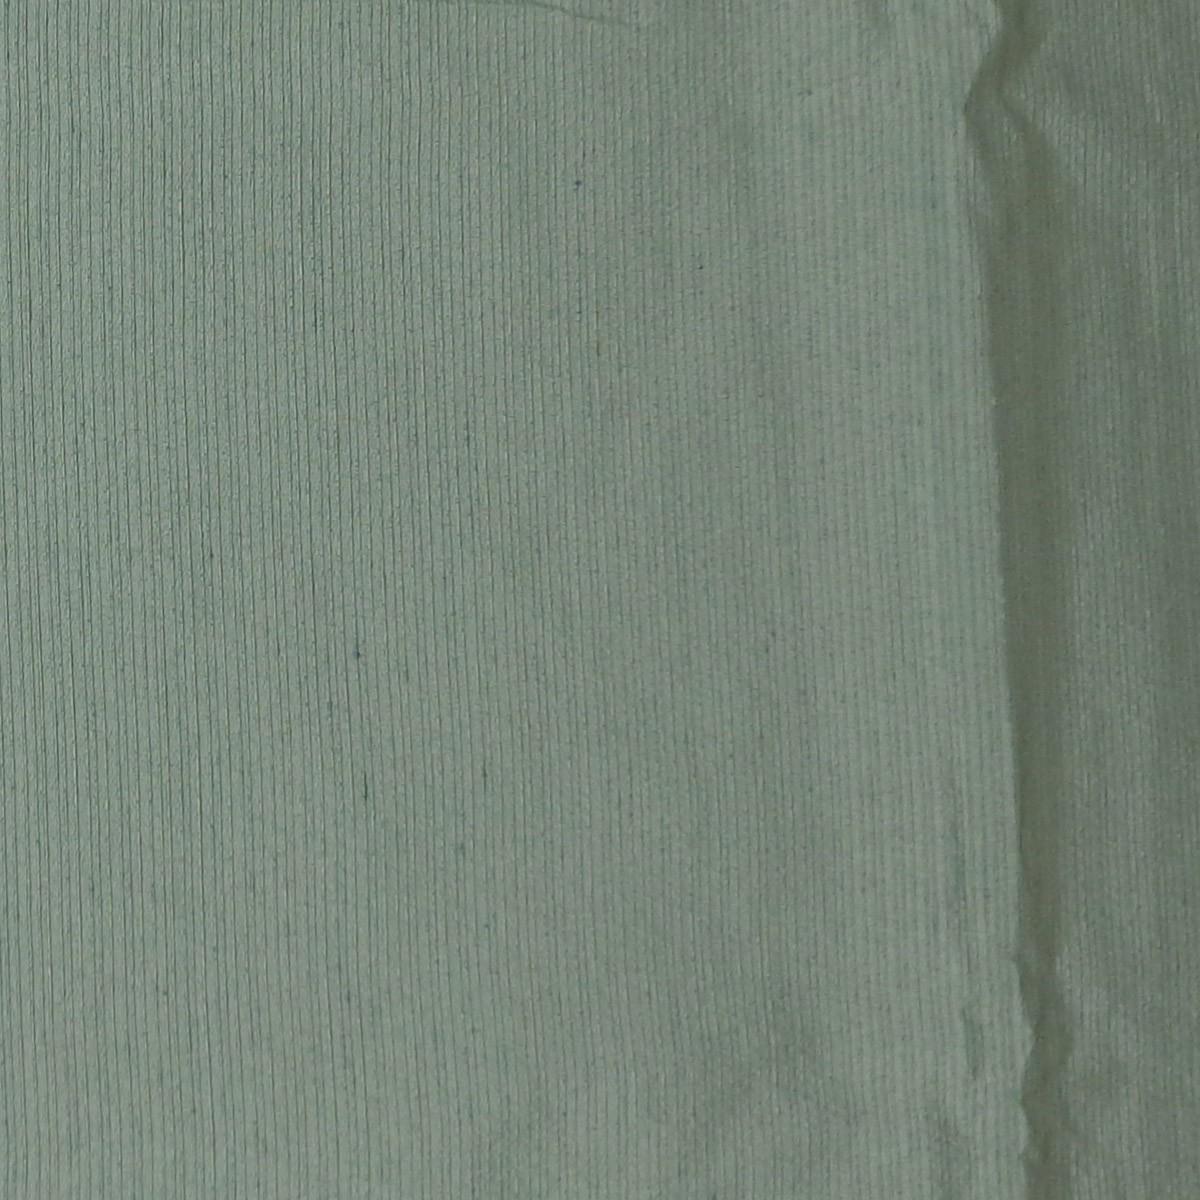 Cortina Para Sala Rústica Pantex Verde Musgo 2,60 x 2,30 Bella Janela